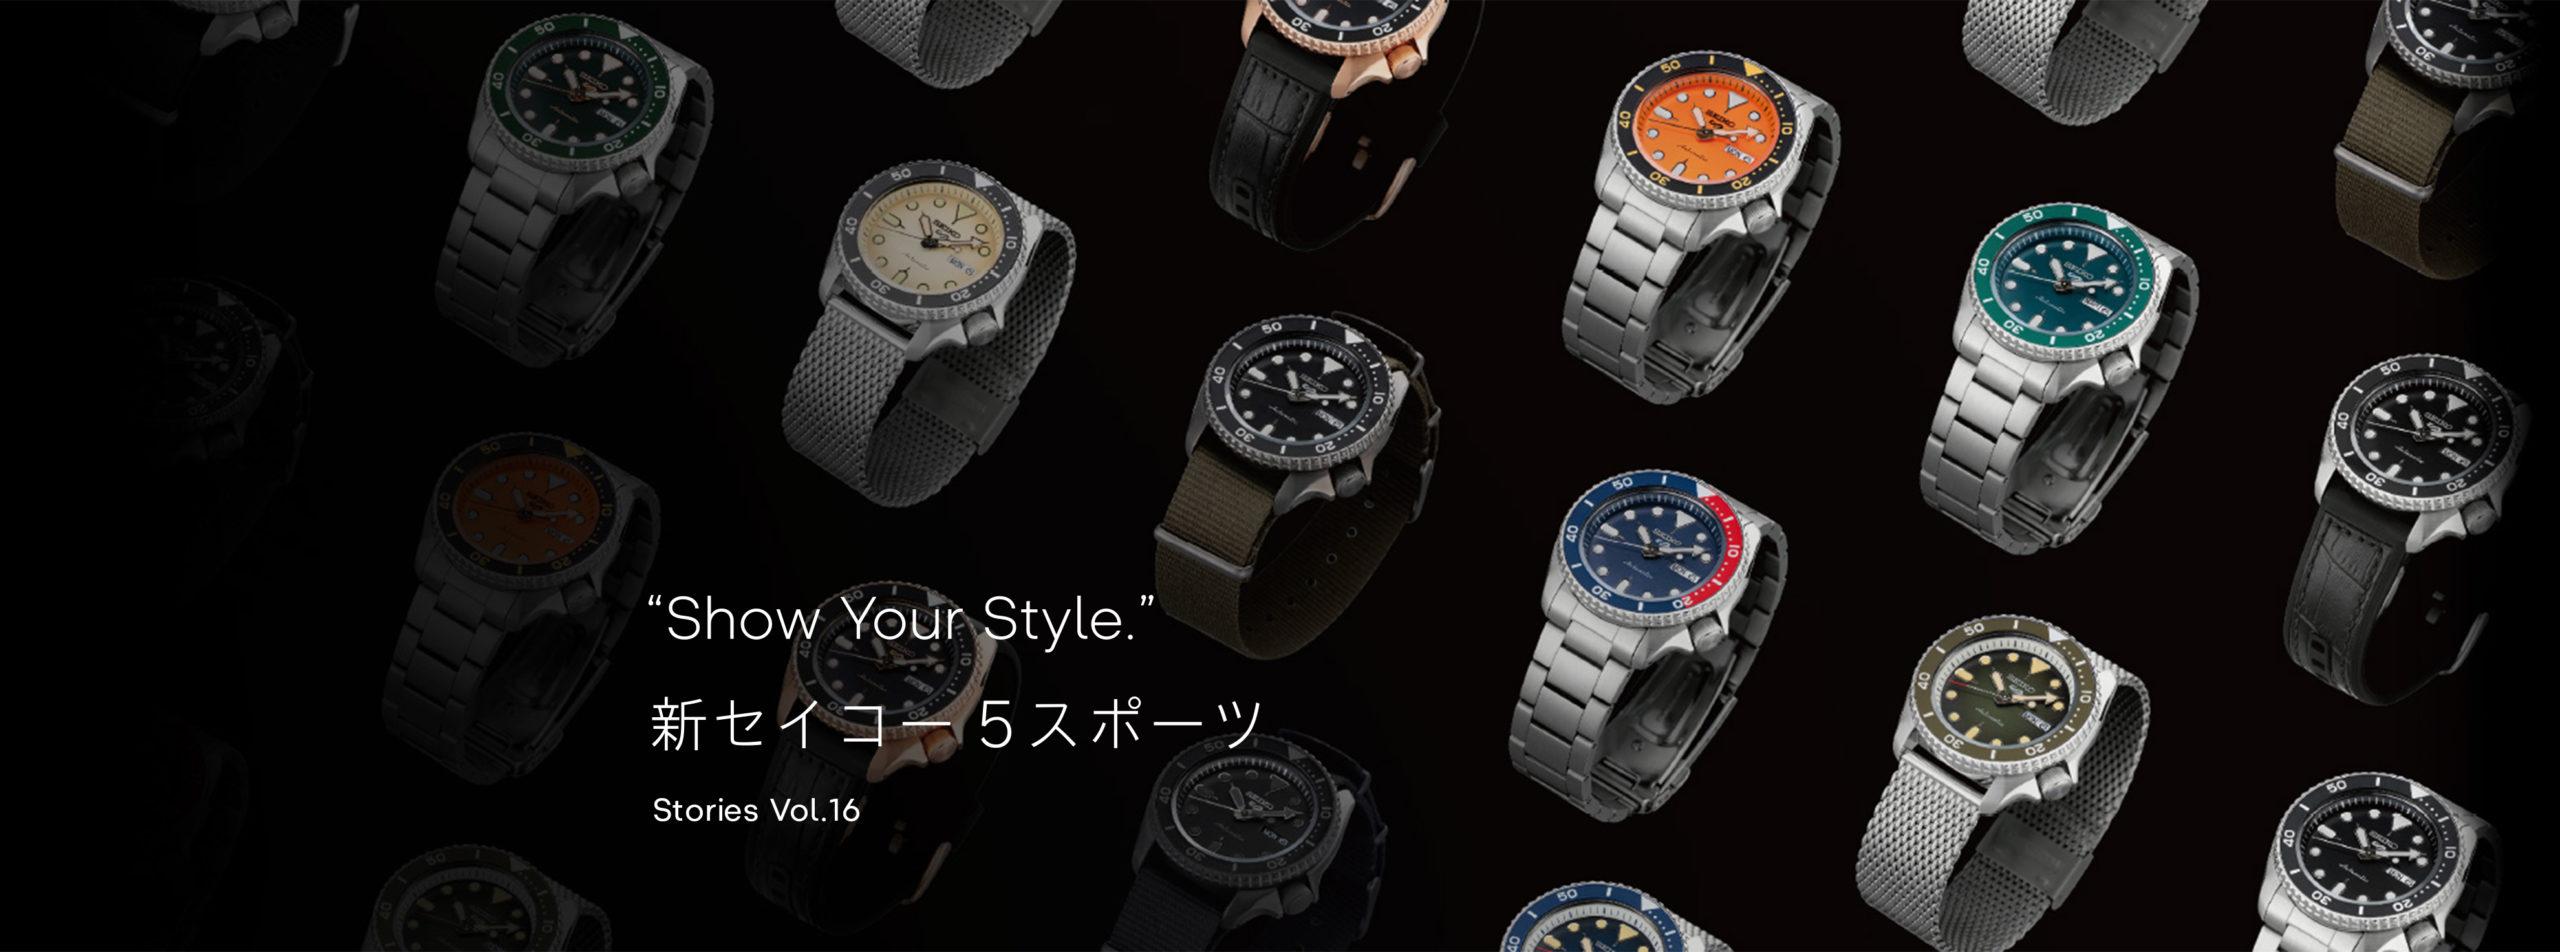 "Vol.16 ""Show Your Style."" 新セイコー 5スポーツ"